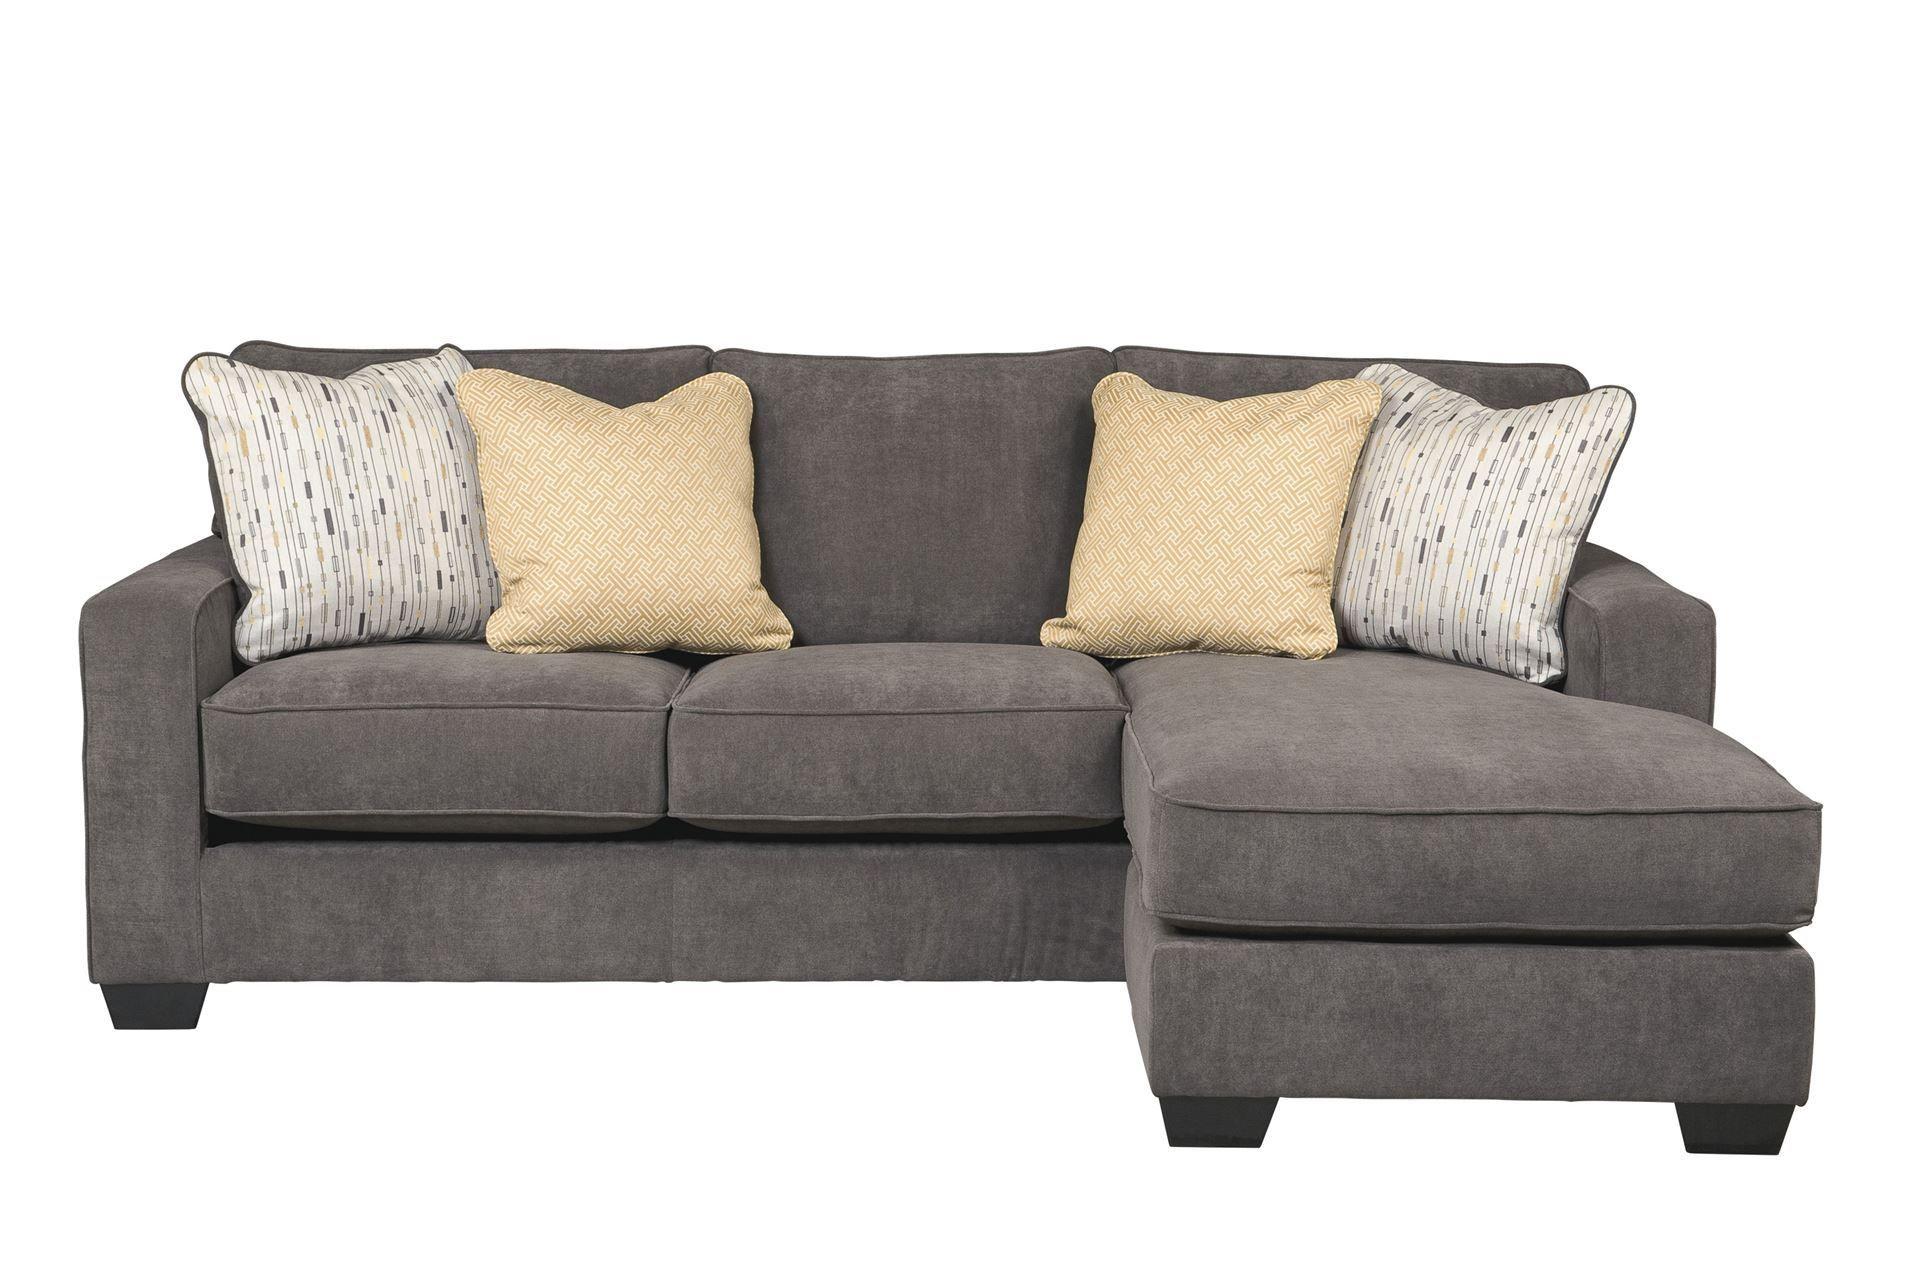 sofasandmore theatre sofa seating hodan chaise home decor pinterest green pillows